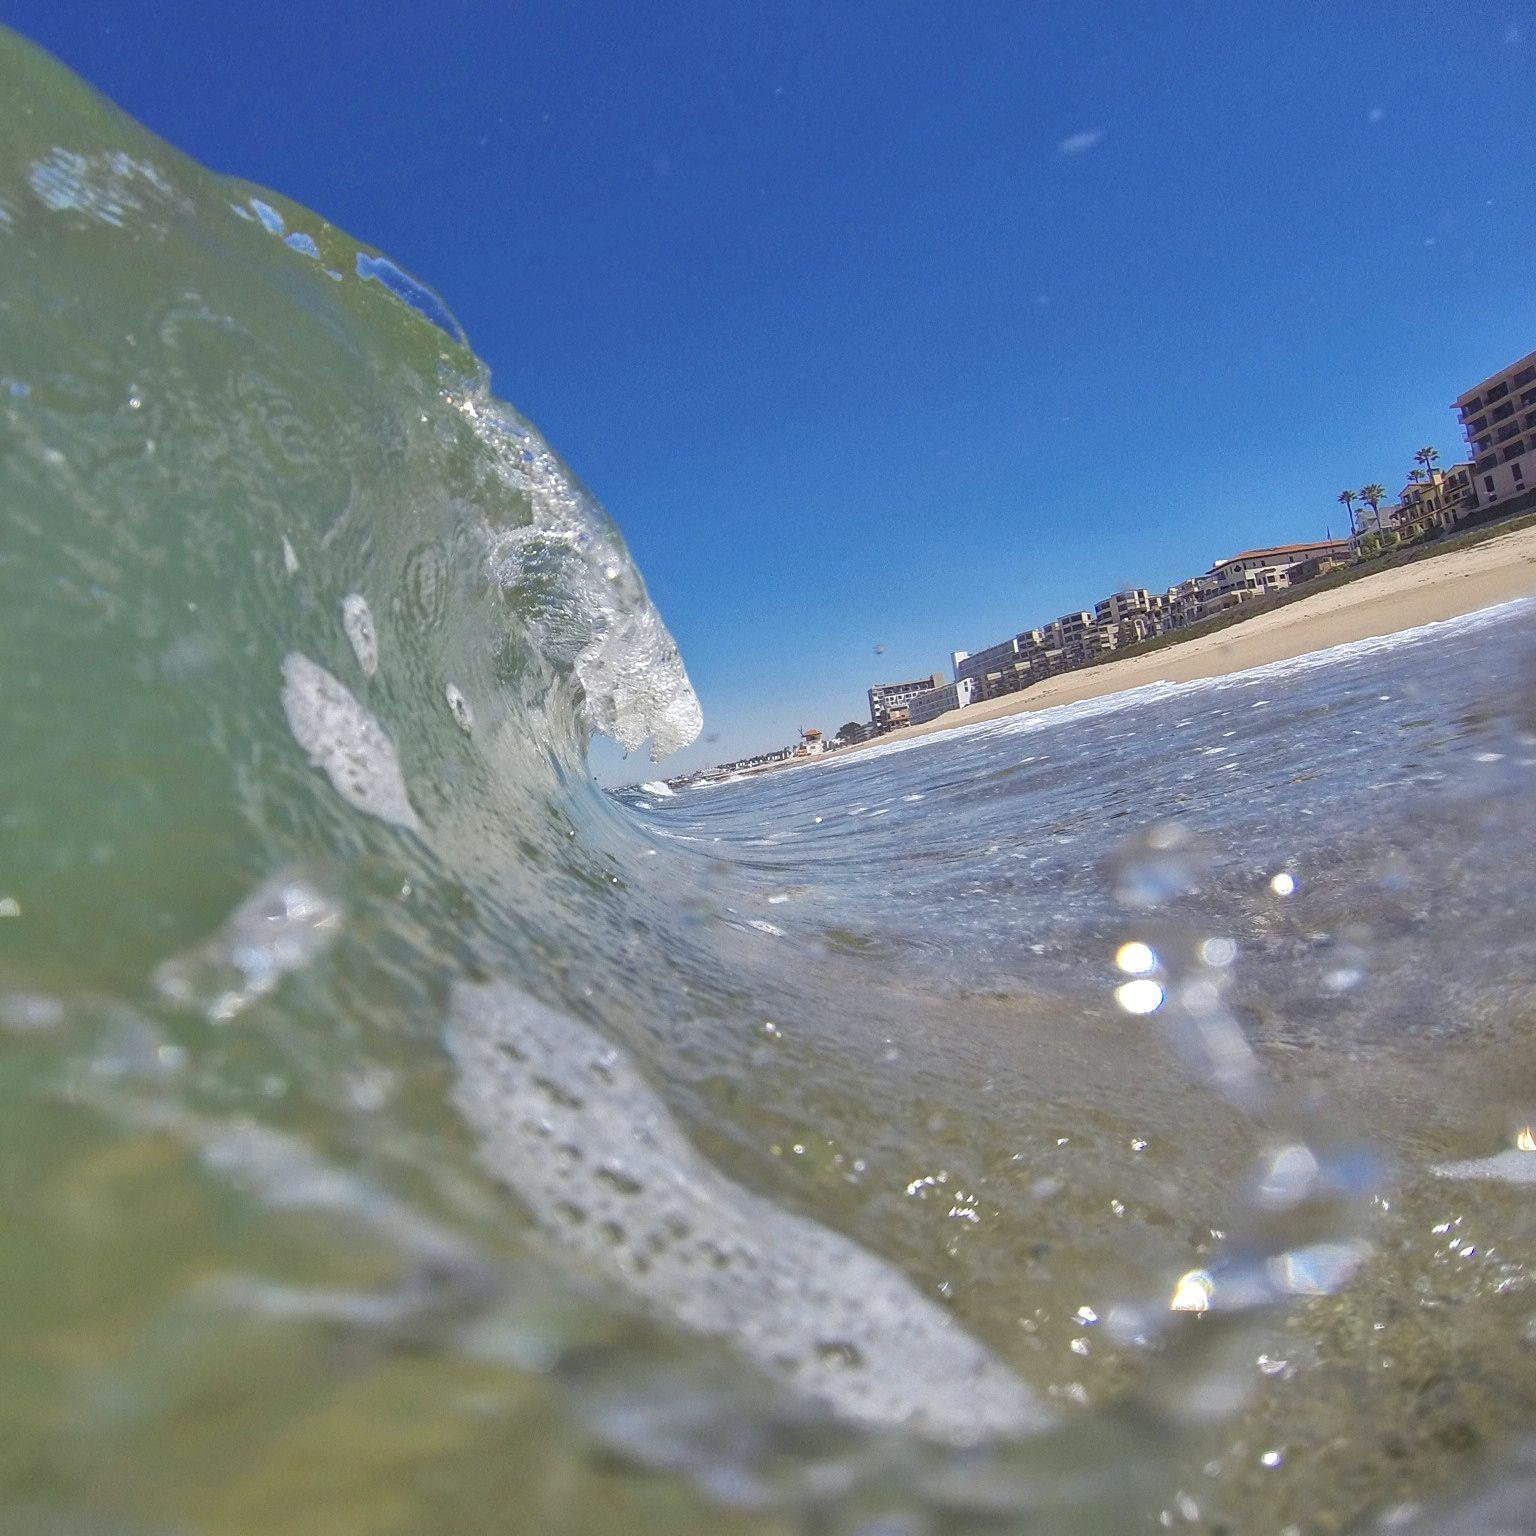 Aloha Friday! Enjoy the weekend! 12mp photo captured with GoPro ...